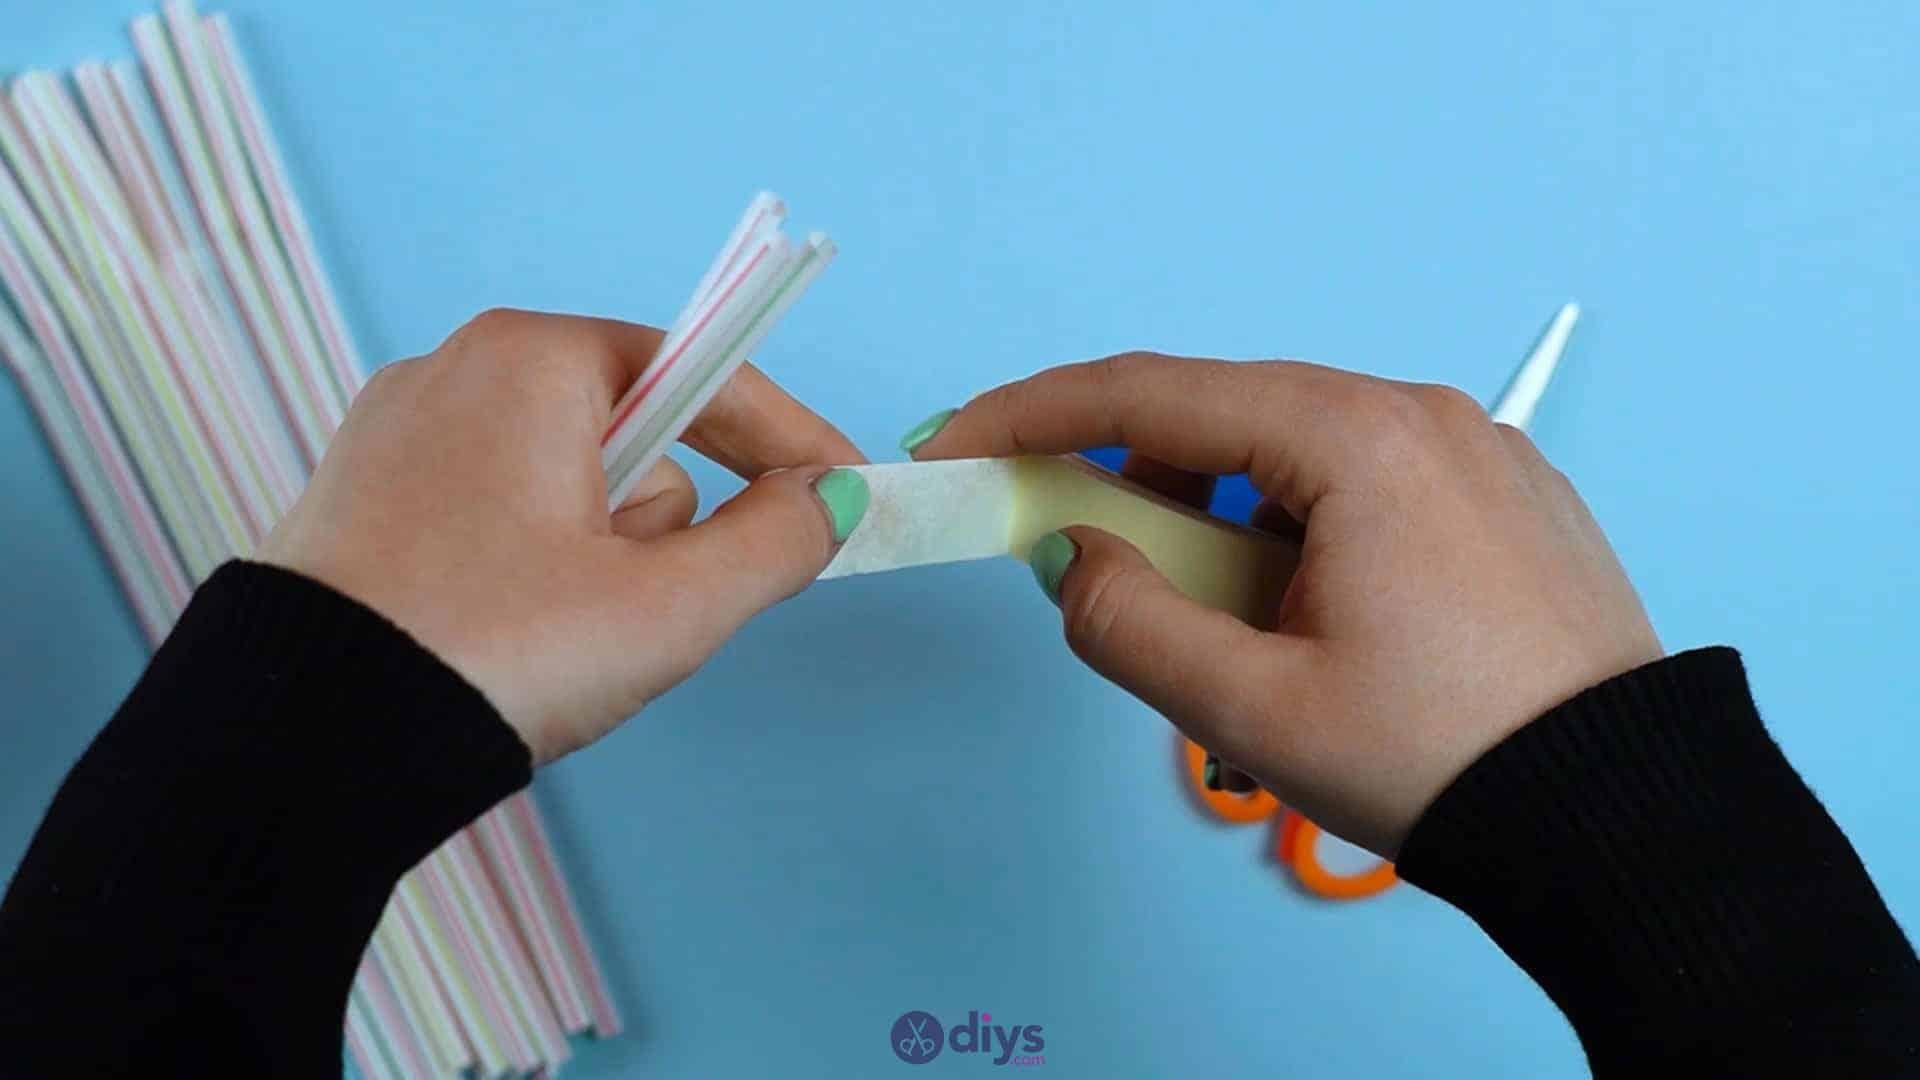 Diy concrete pencil holder step 2b